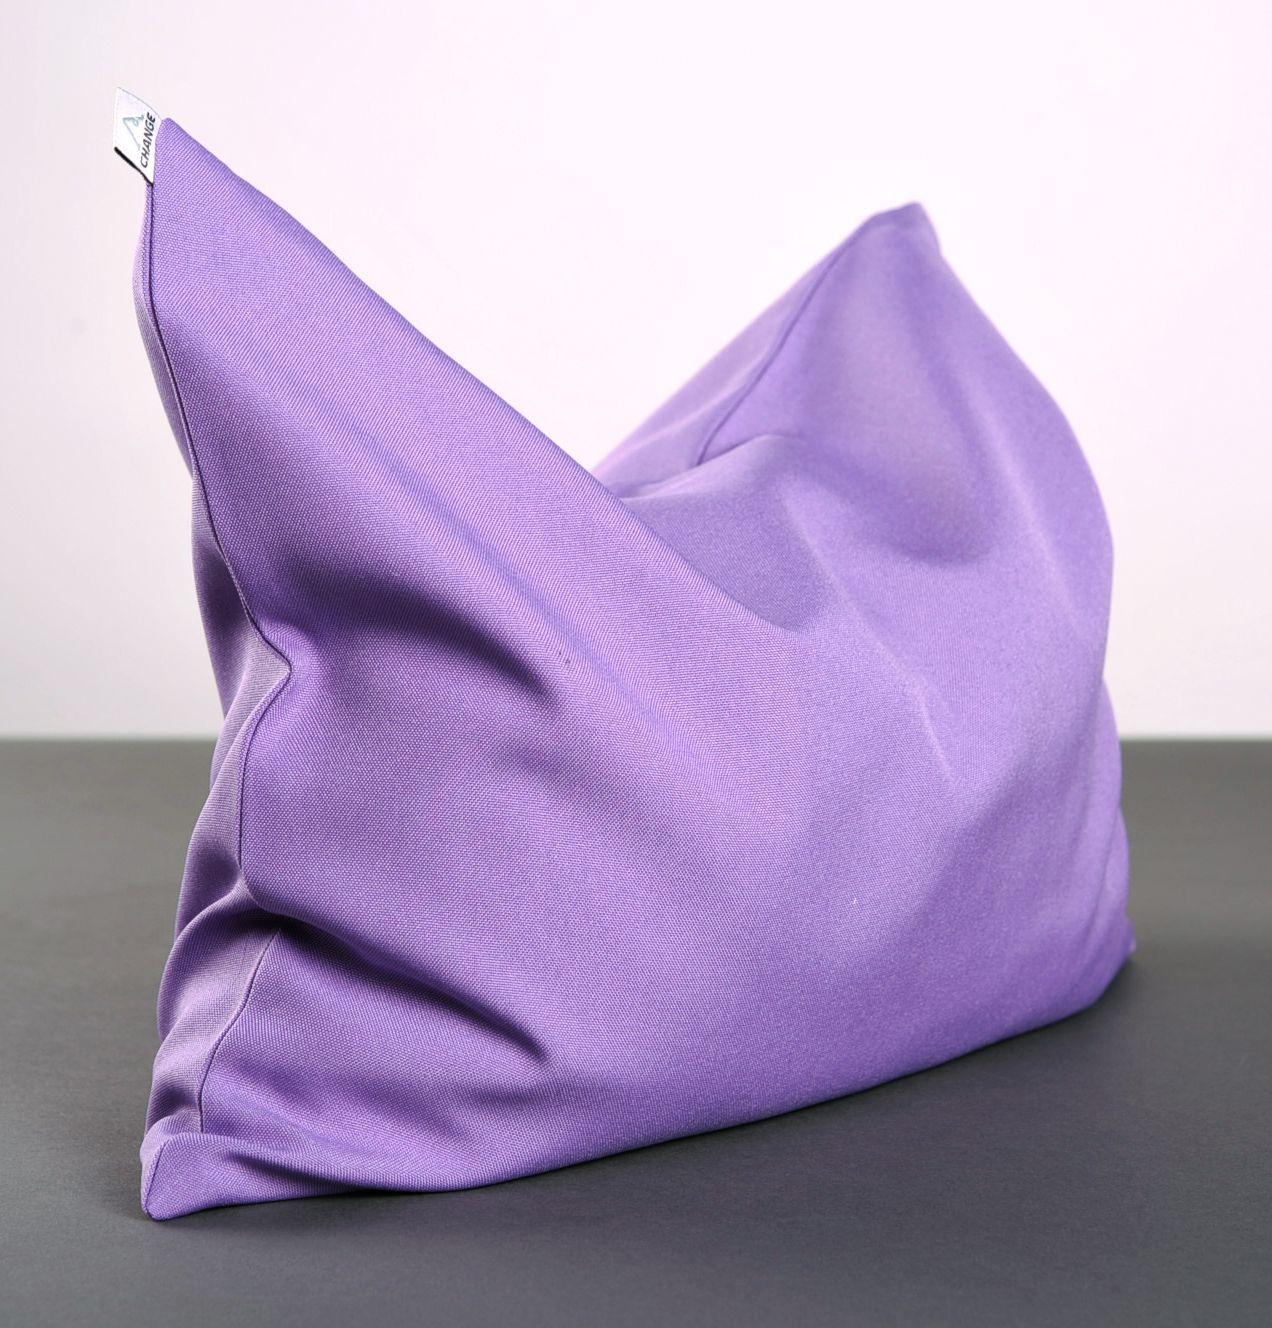 Pillow with buckwheat husk photo 5